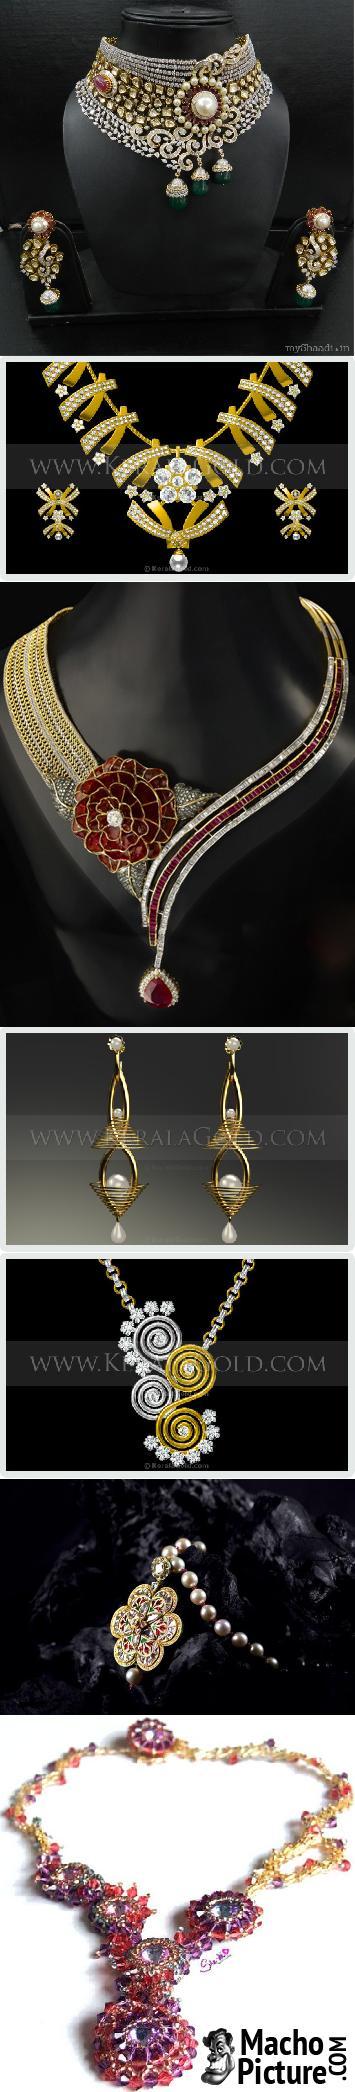 Designer jewellery - 8 PHOTO!